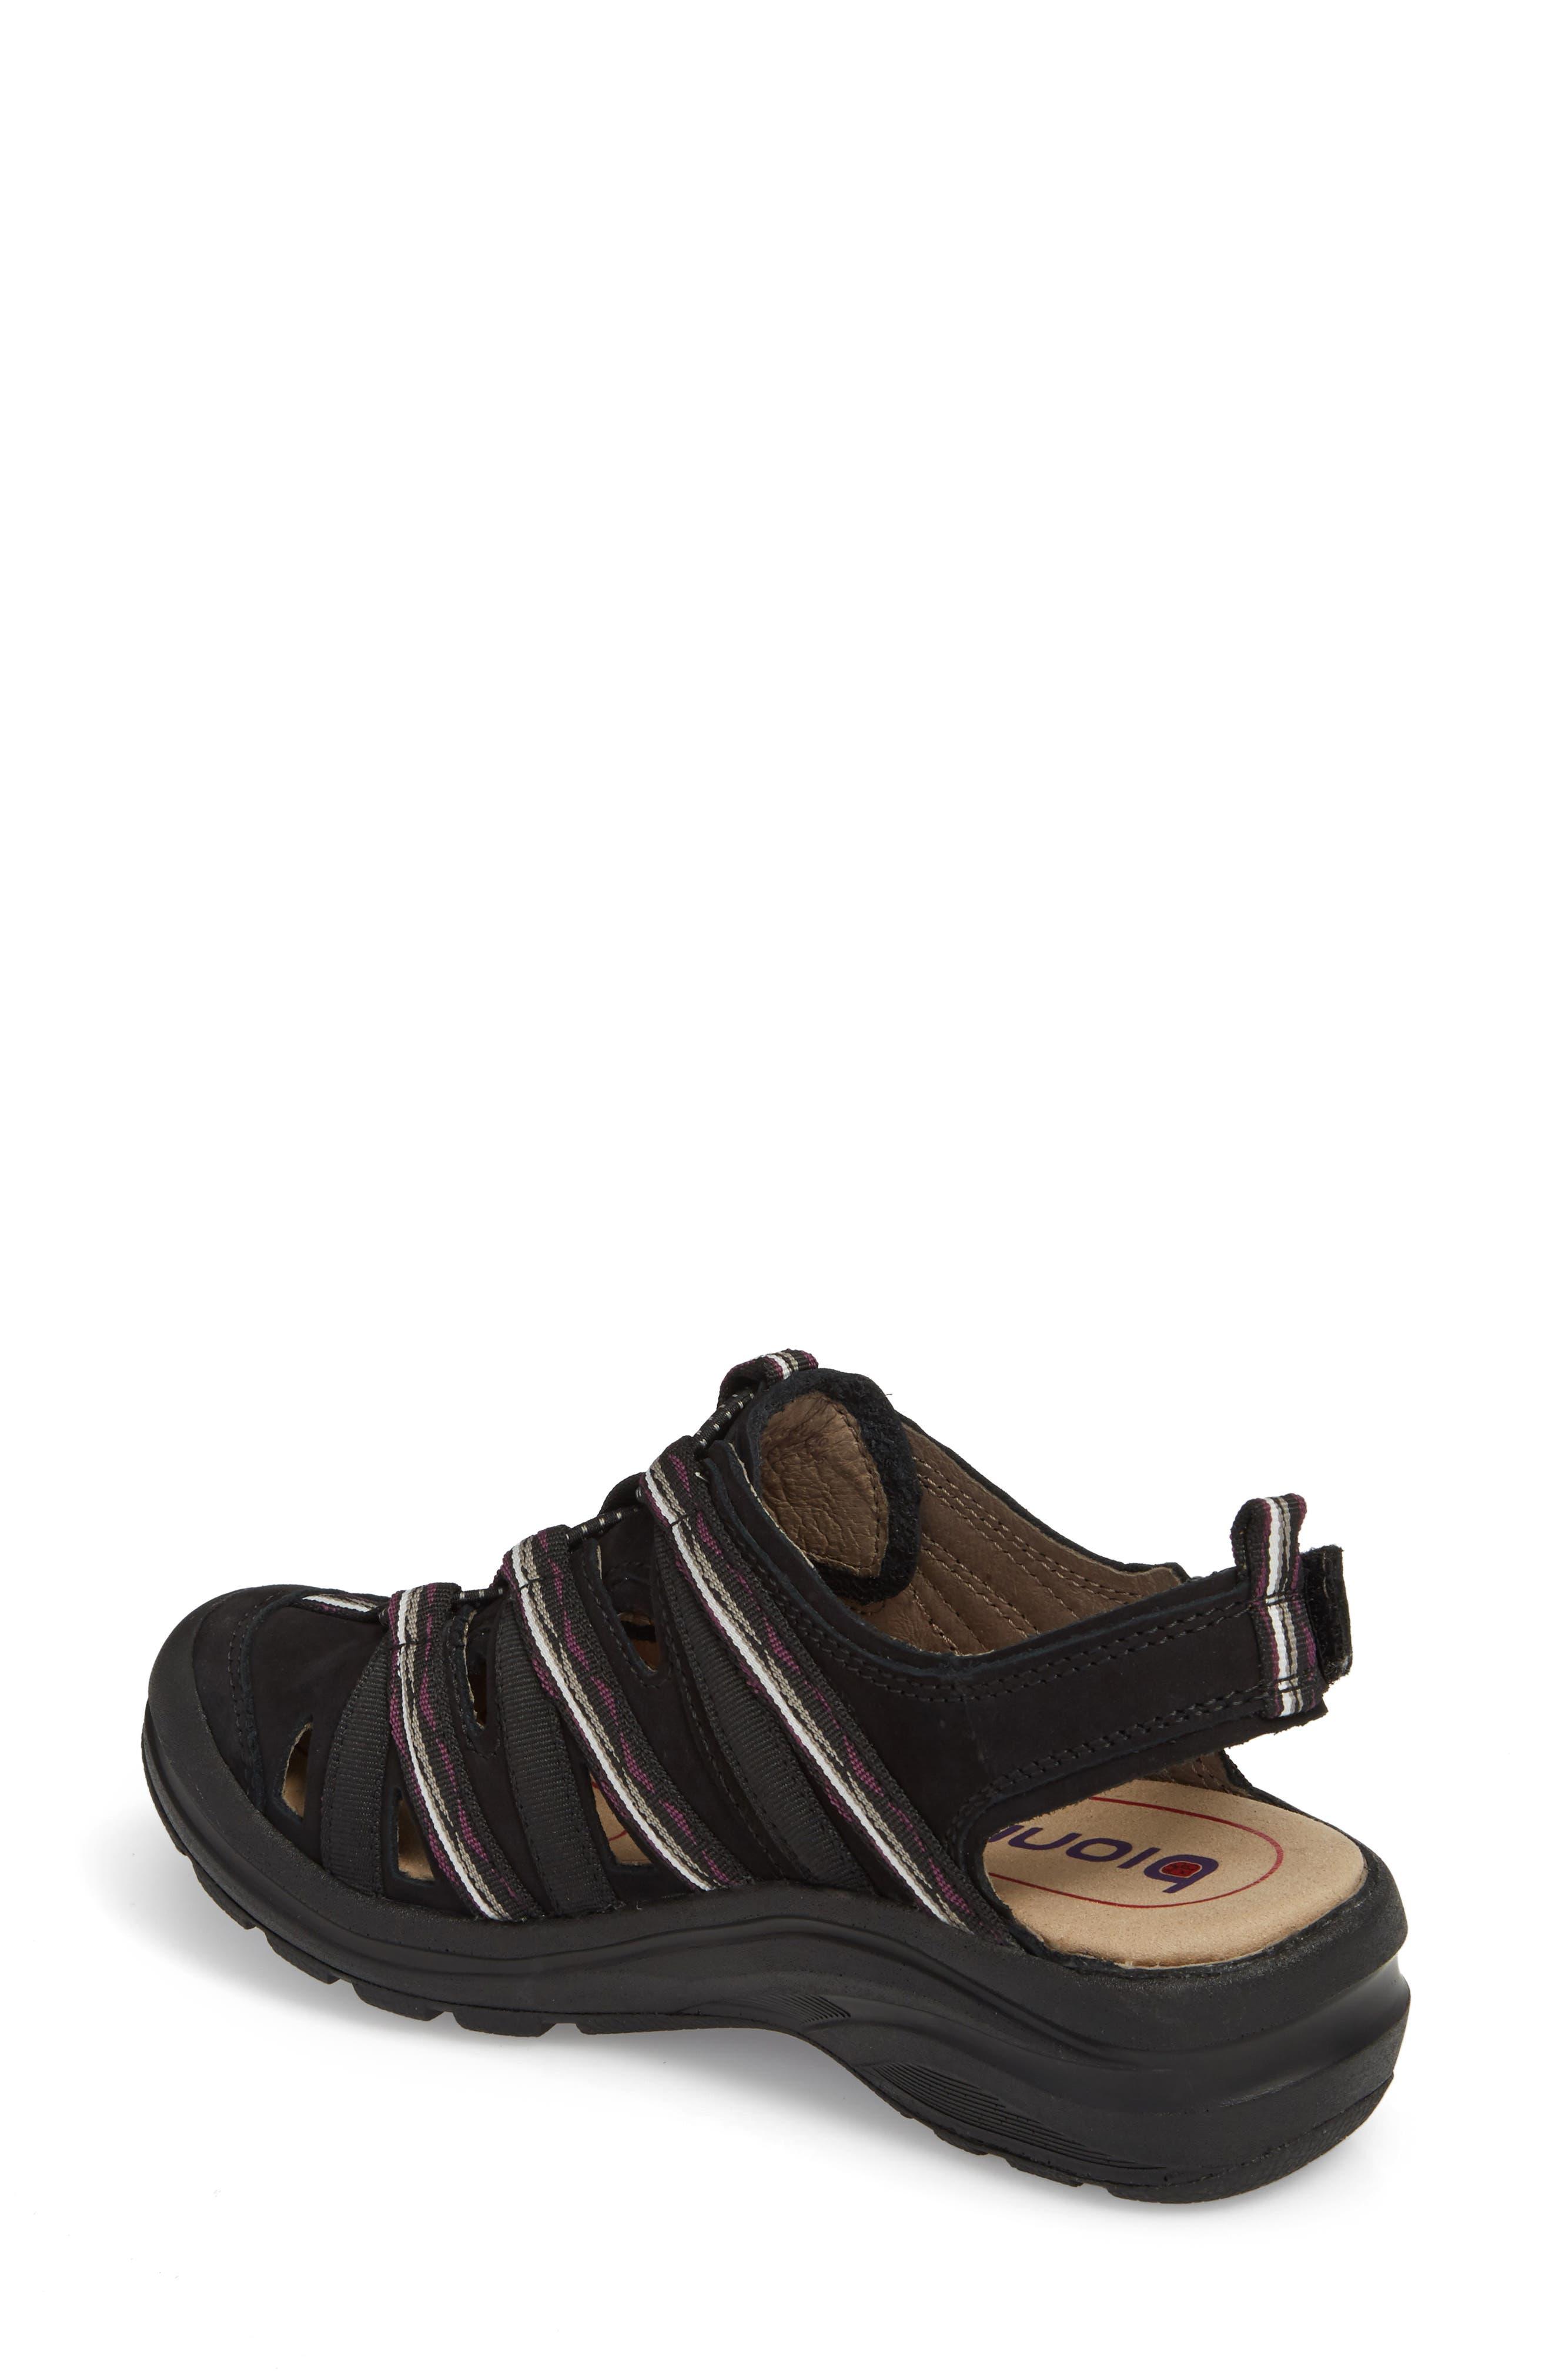 Malabar Sport Sandal,                             Alternate thumbnail 2, color,                             BLACK LEATHER